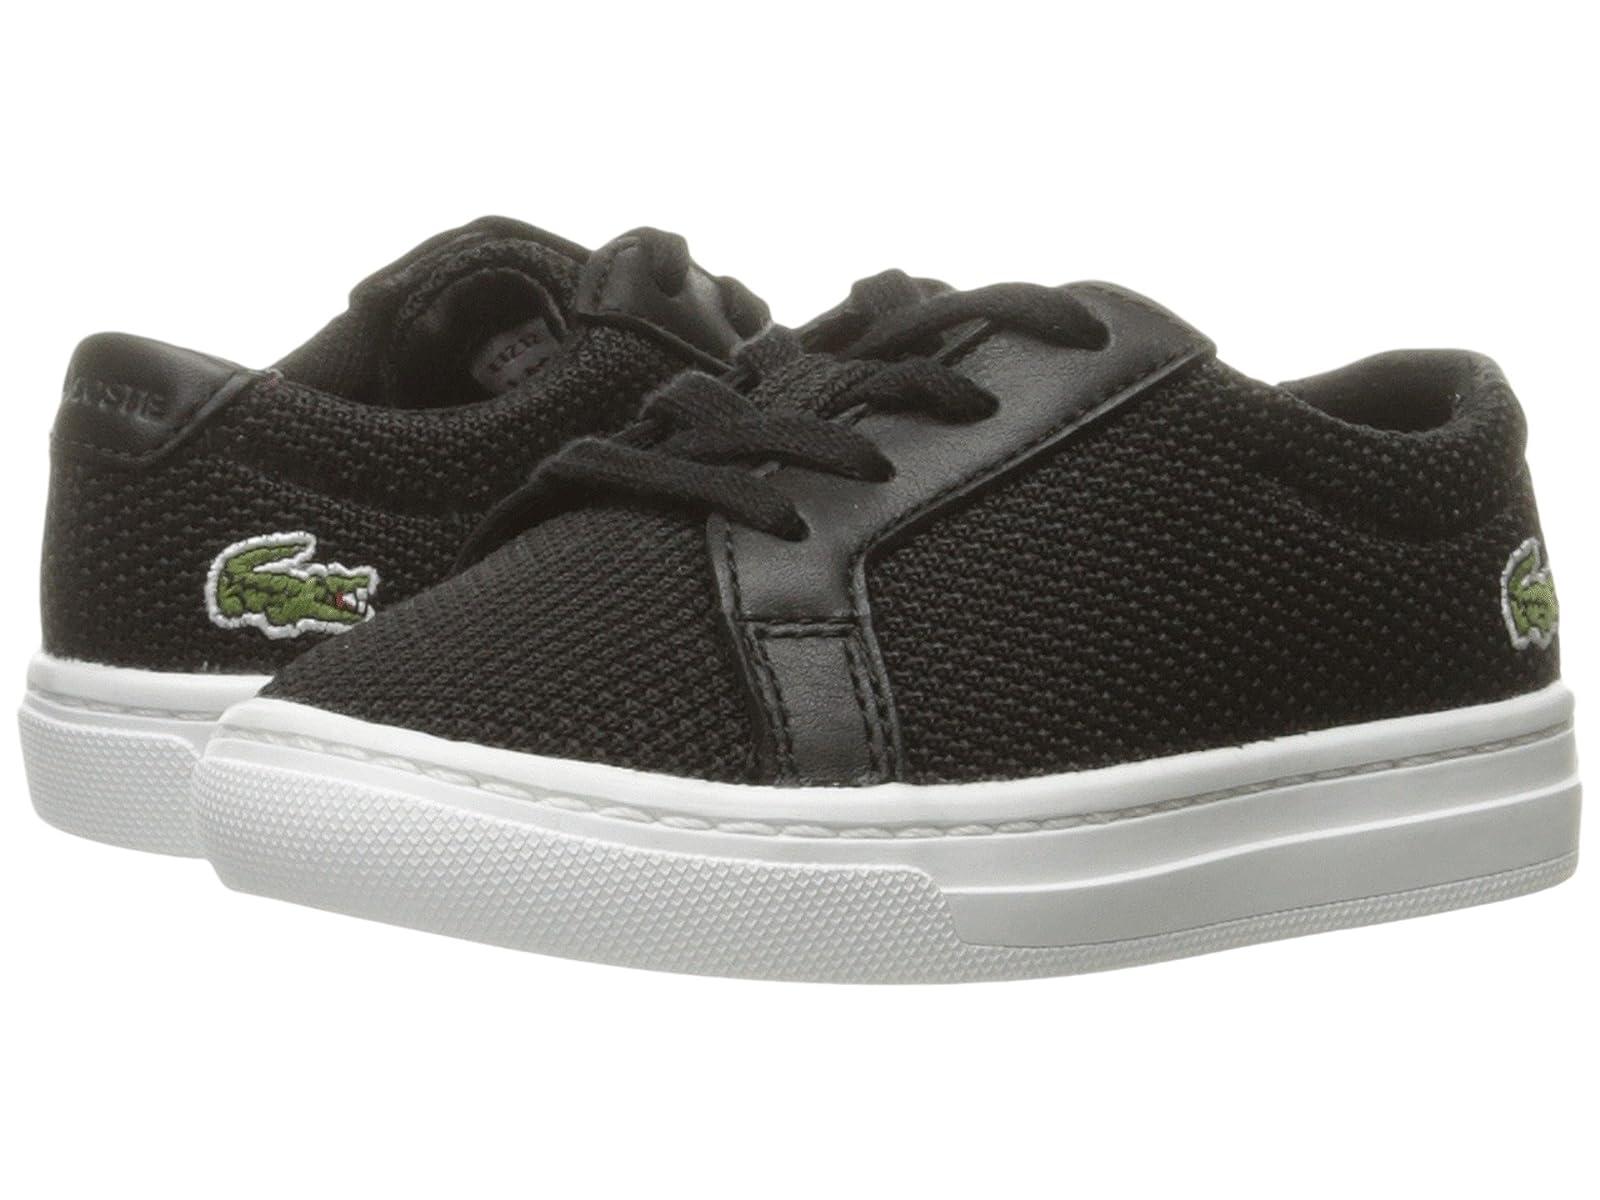 Lacoste Kids L.12.12 (Toddler/Little Kid)Atmospheric grades have affordable shoes